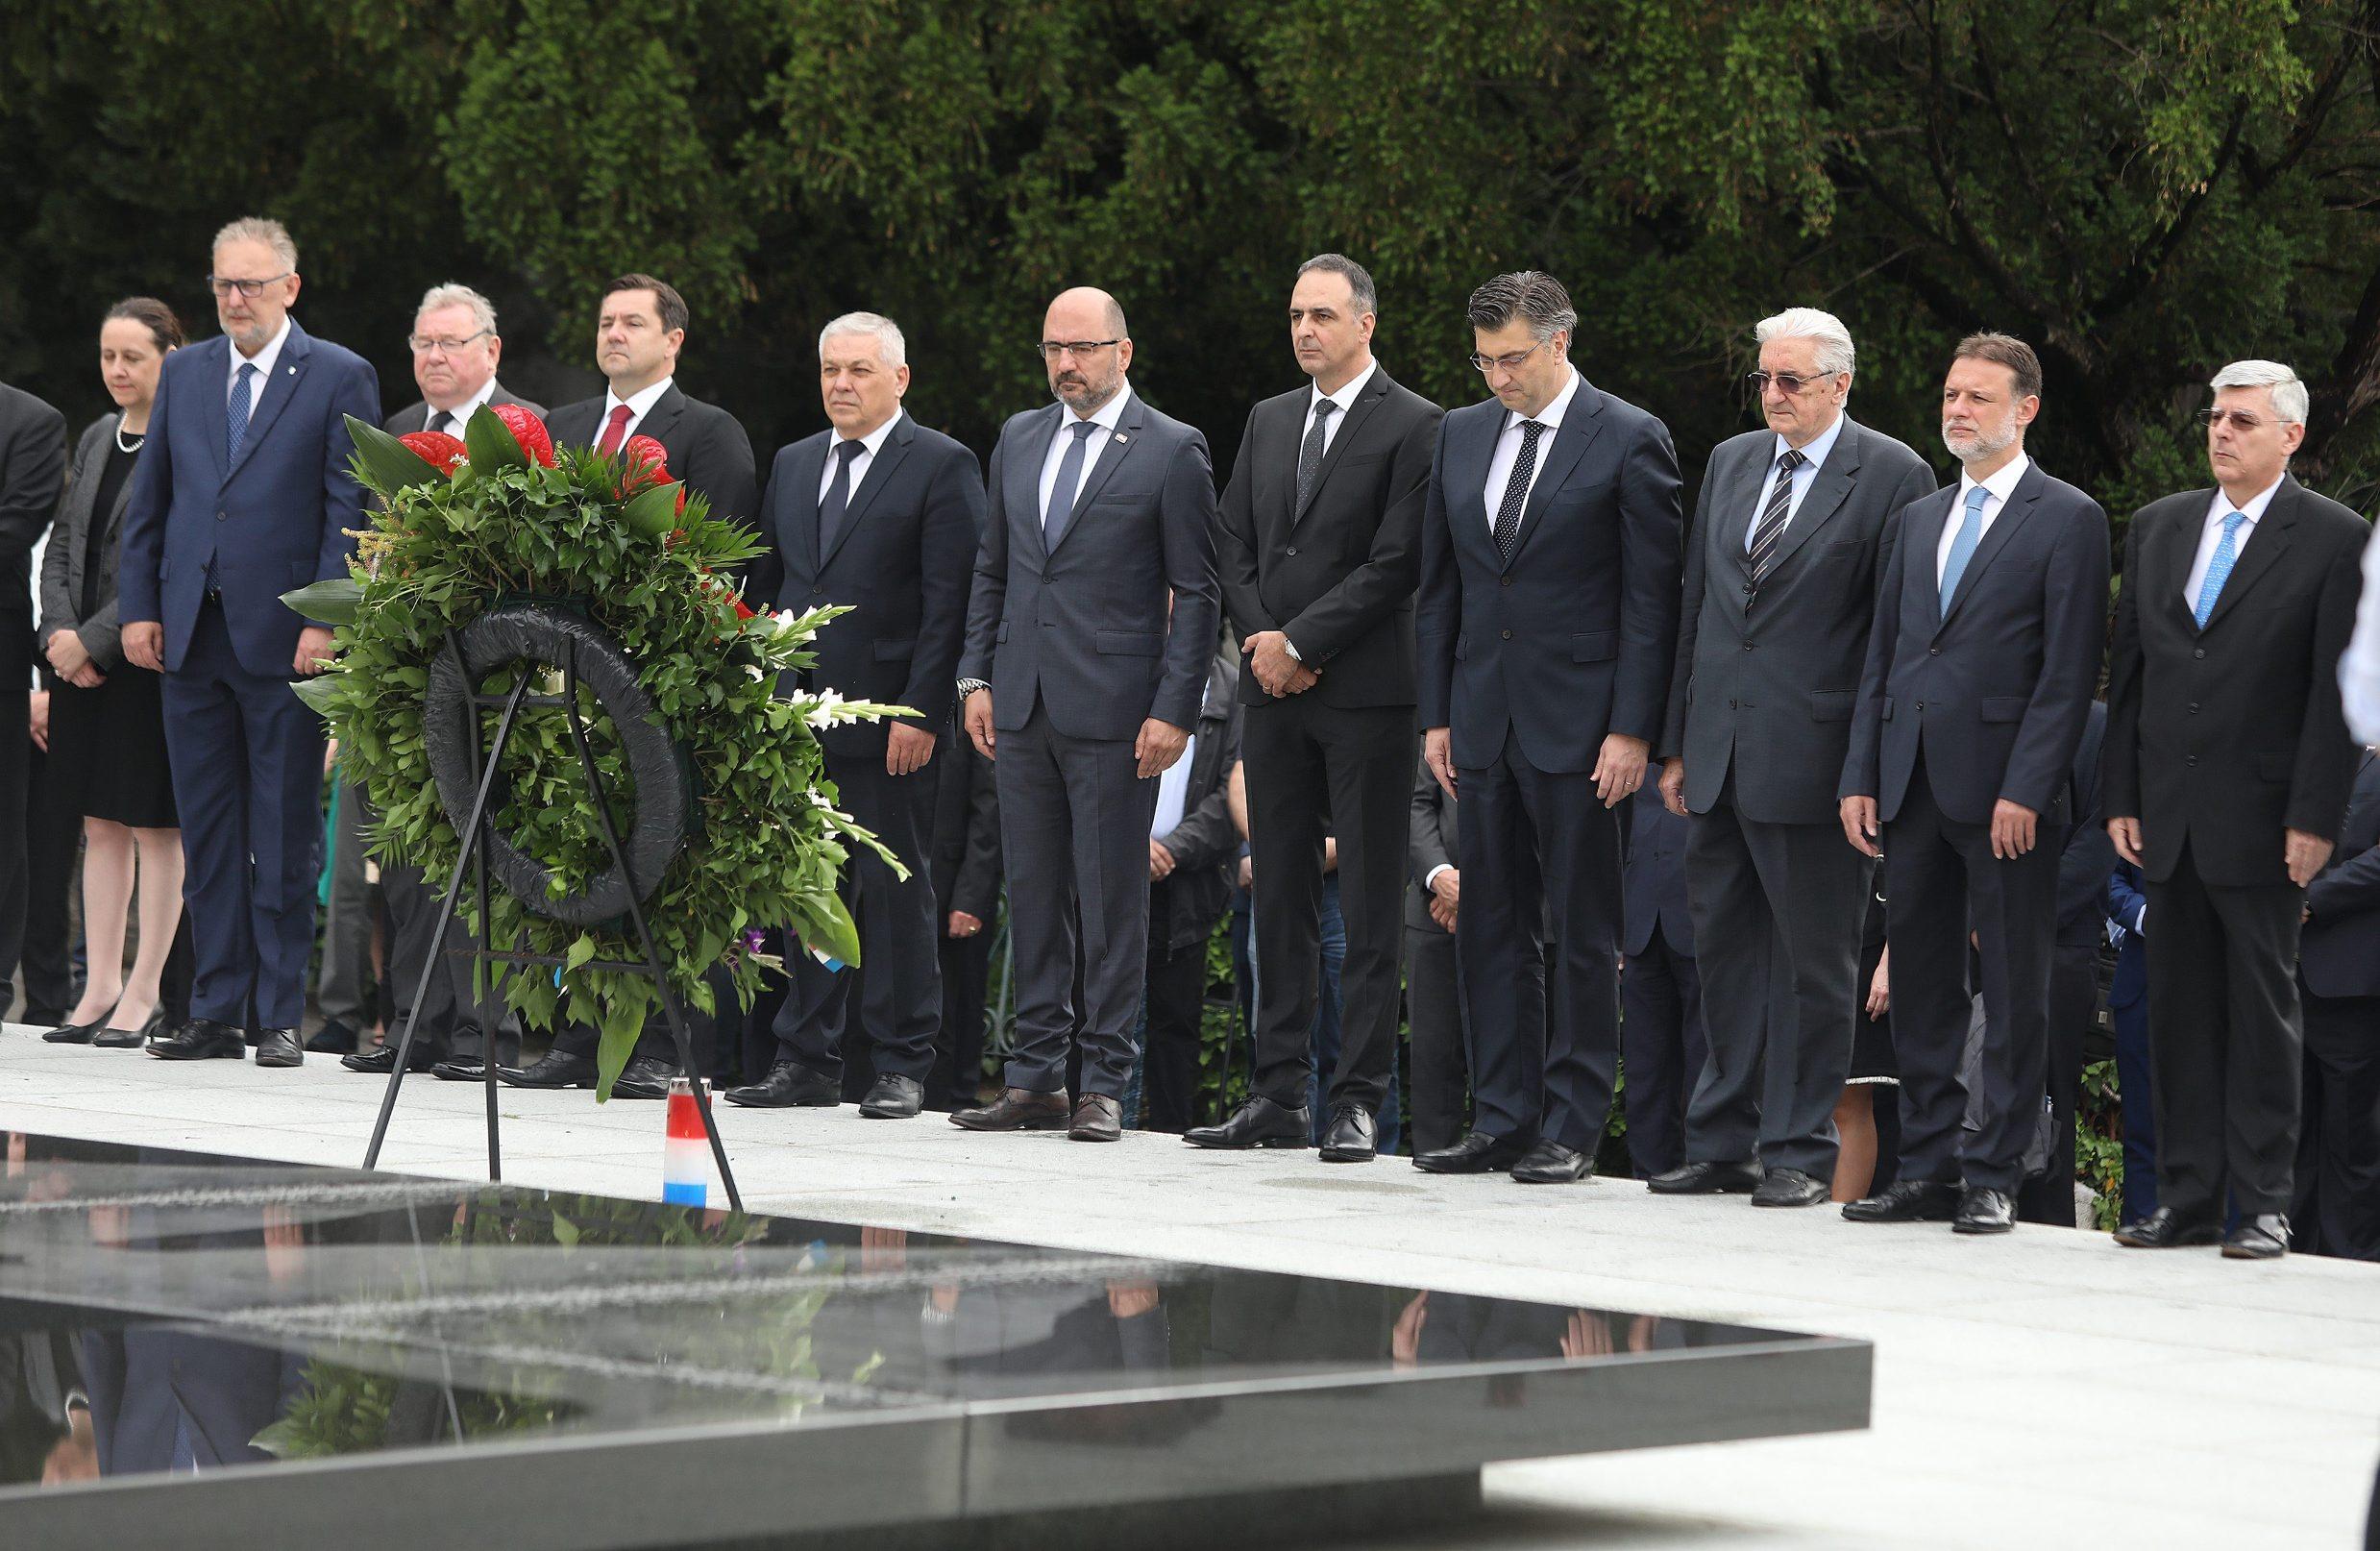 Milijan Brkić, Andrej Plenković, Miroslav Tuđman, Gordan Jandroković i Željko Reiner.